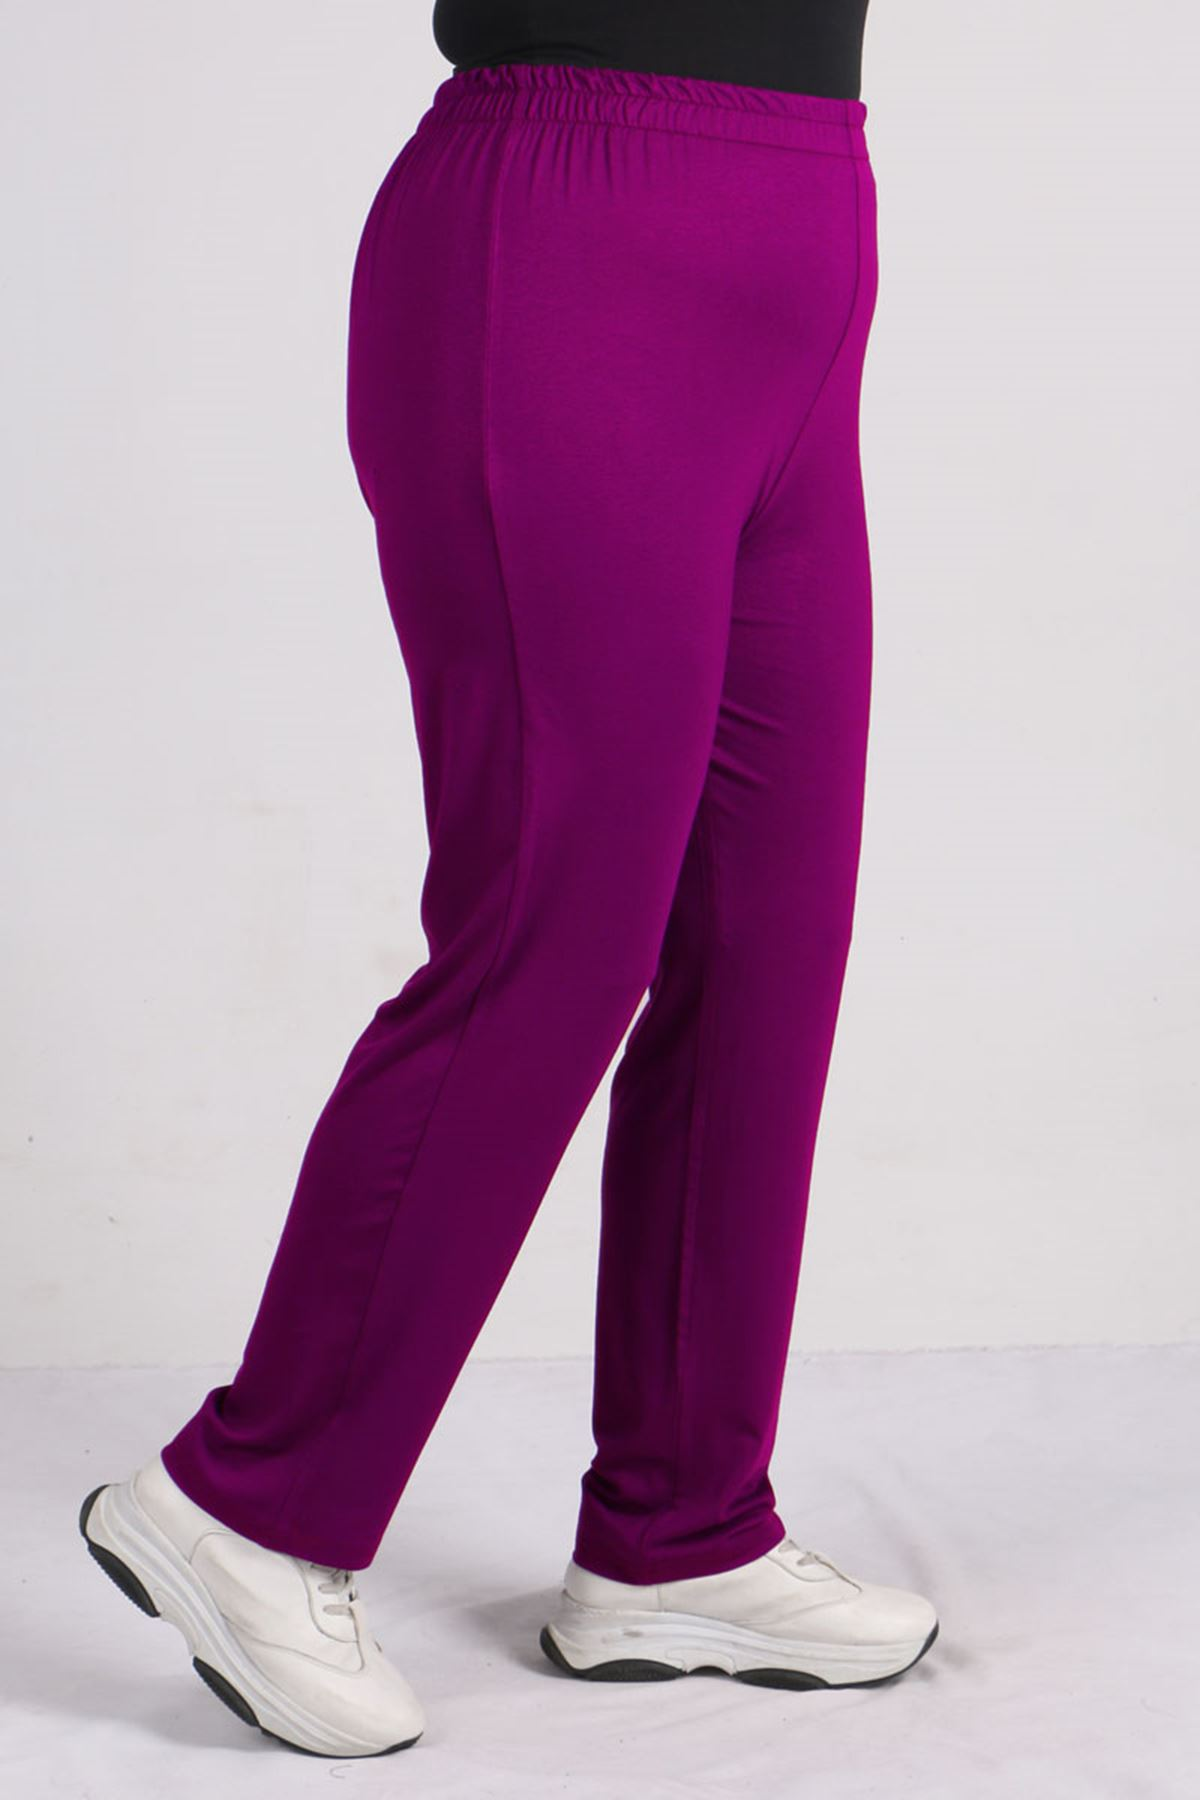 9057 Plus Size High Waist Elastic Pants - Light Purple